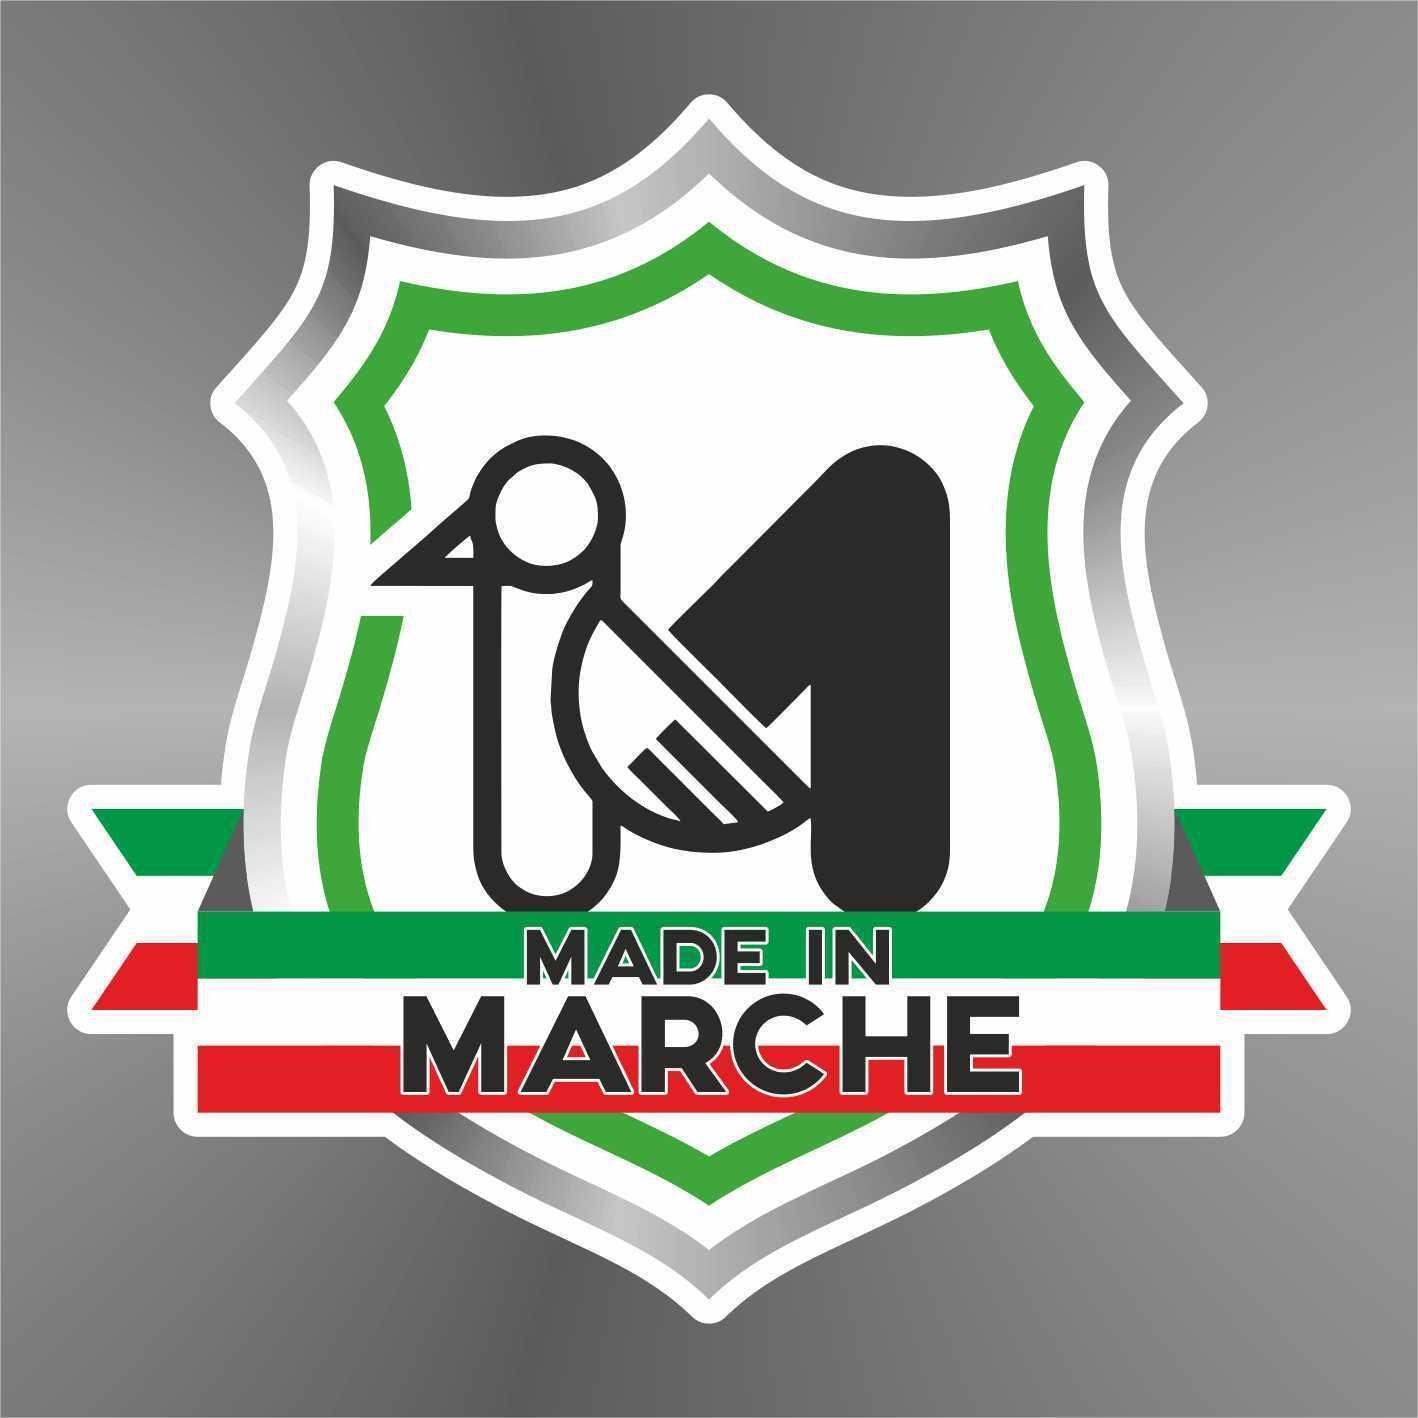 Erreinge sticker marche marcas marches marken italia italy italie italien decal cars motorcycles helmet wall camper bike adesivo adhesive autocollant